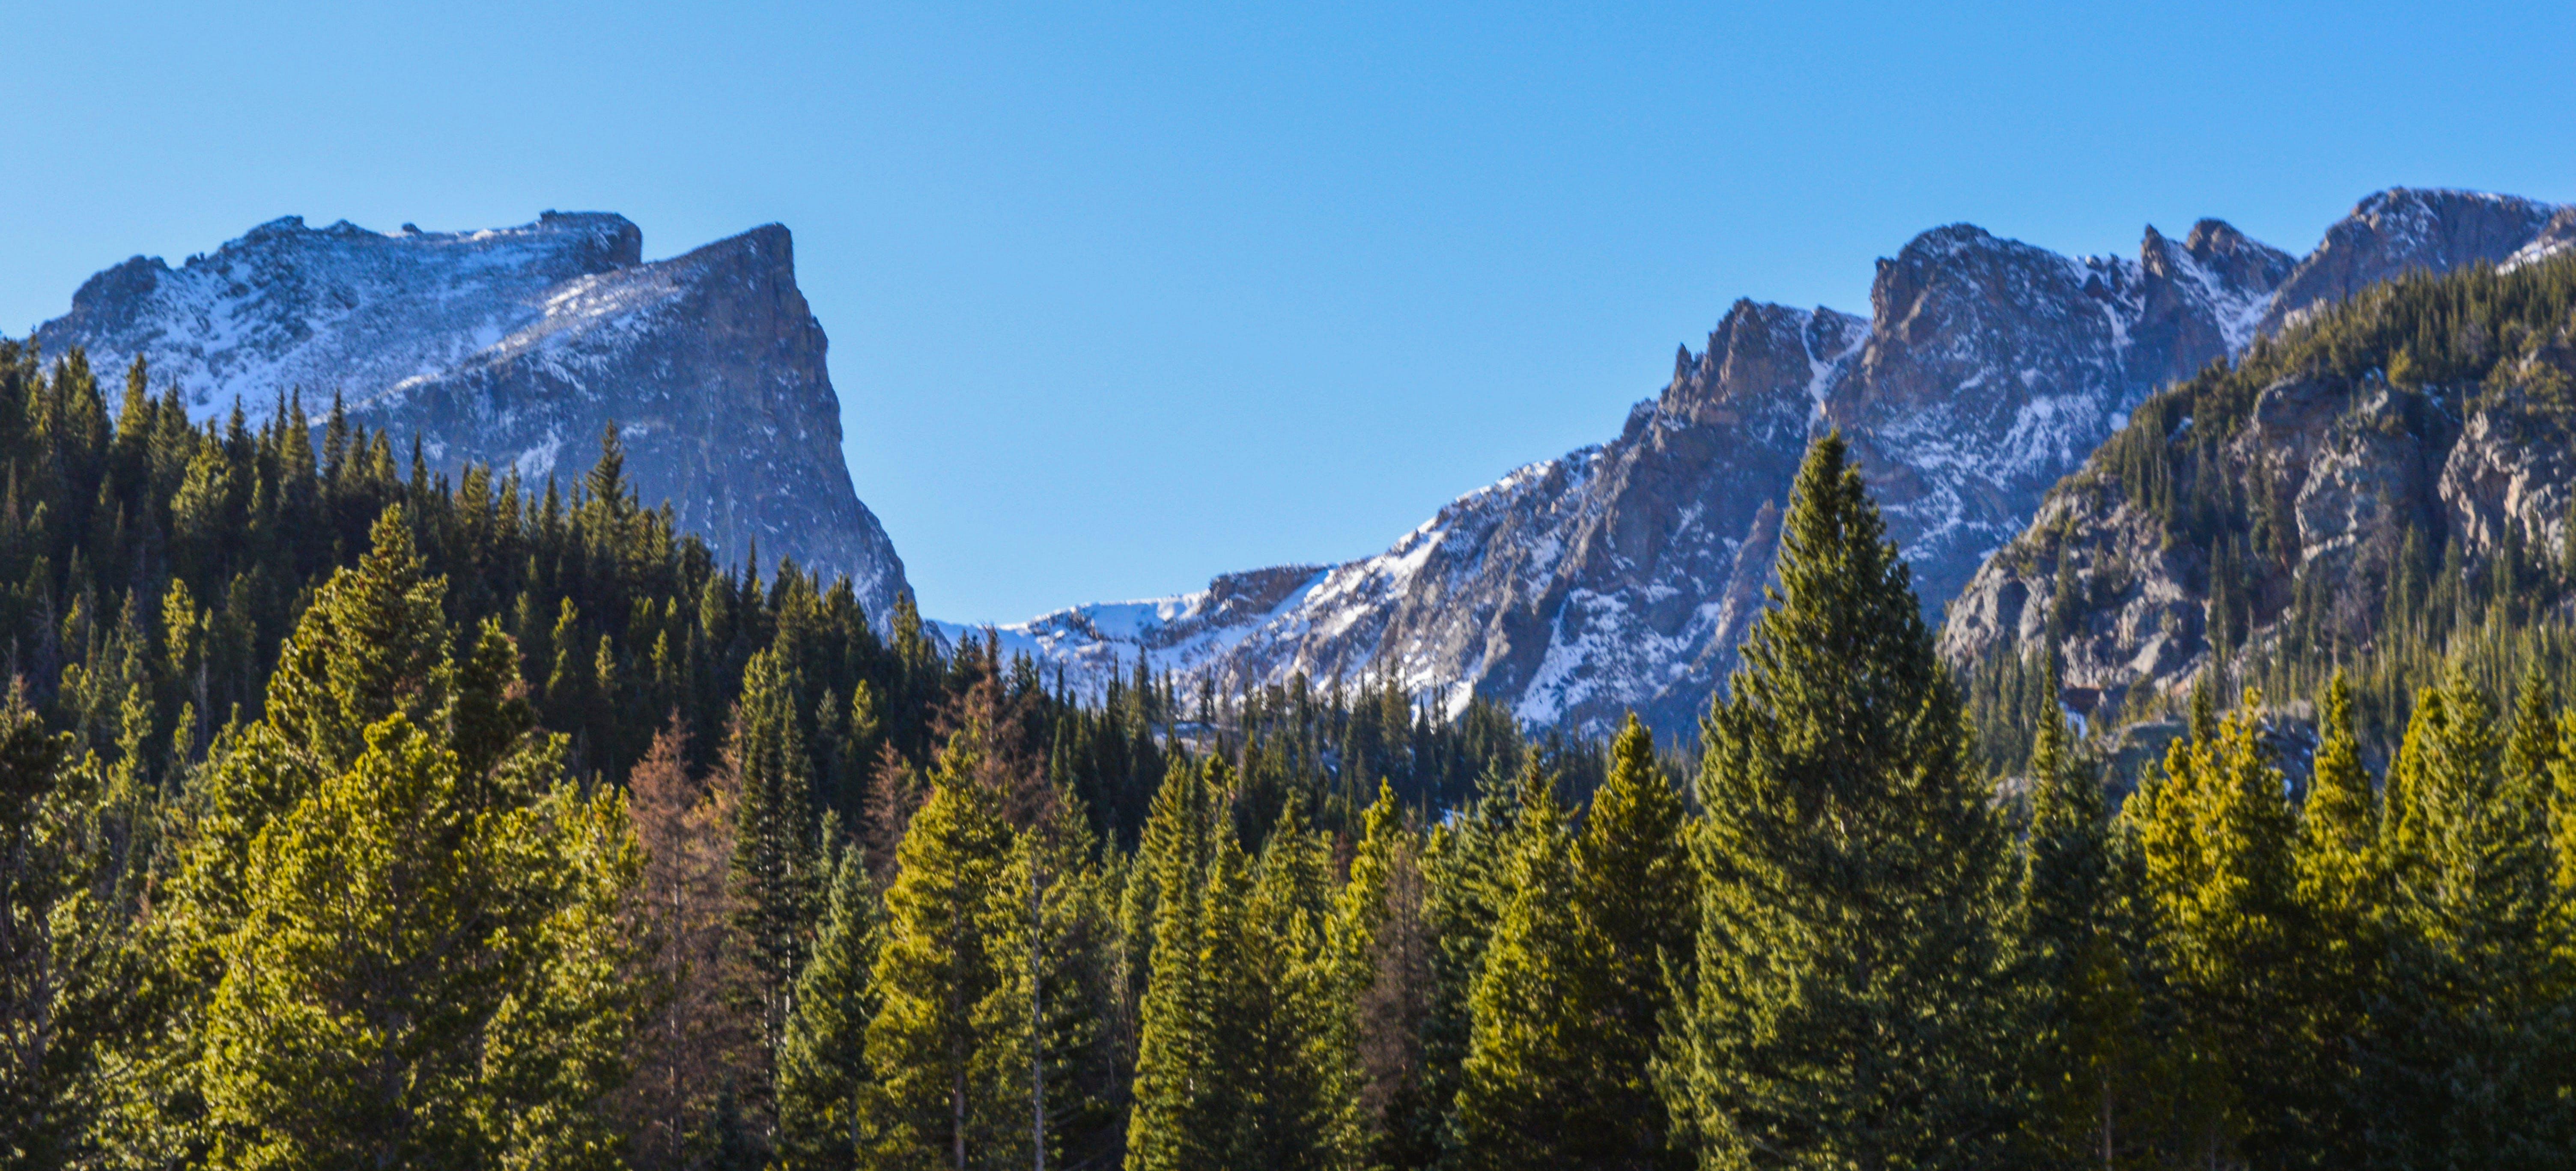 Green Tall Trees Near Mountains